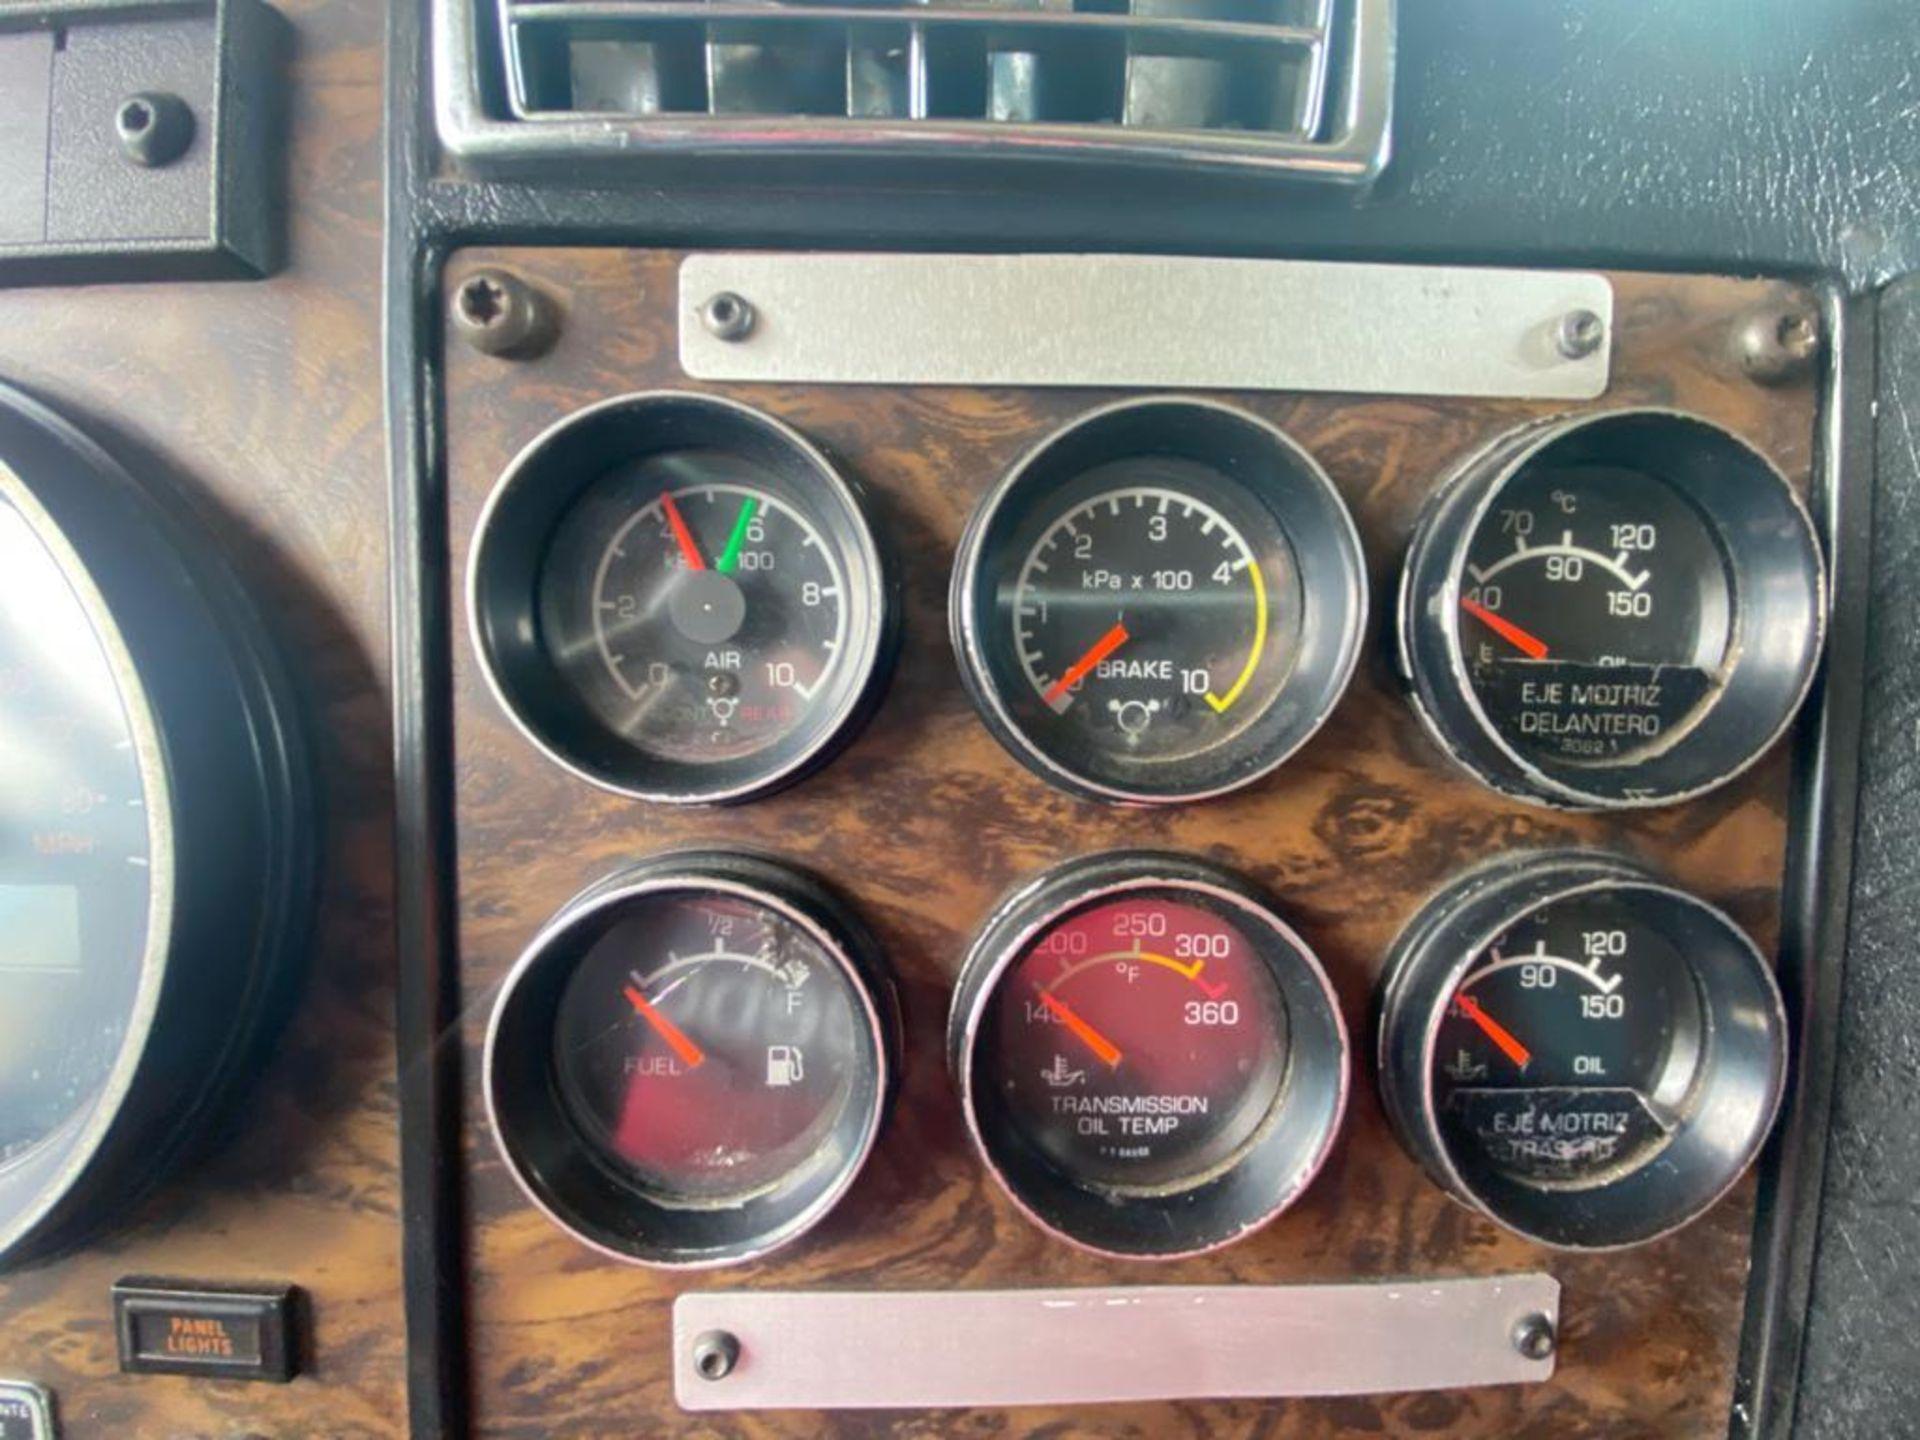 1999 Kenworth Sleeper truck tractor, standard transmission of 18 speeds - Image 33 of 62